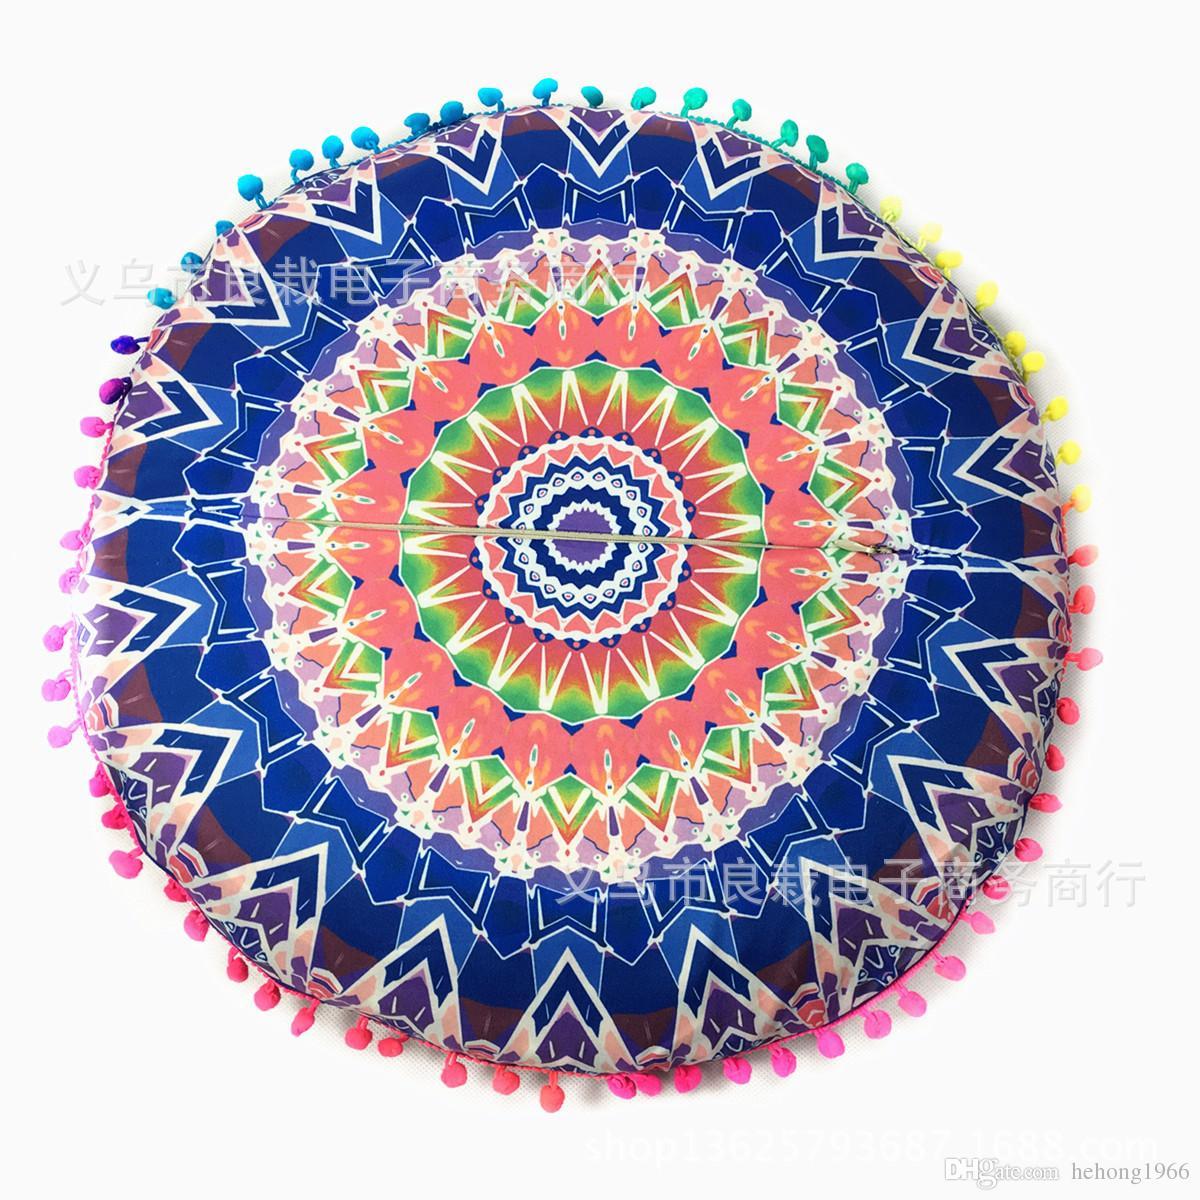 12rz Lotus Feather Mandala Pillows Cases Fodere cuscini stile folk Fodera cuscino rotondo Fodera cuscino in fibra di poliestere digitale stampata